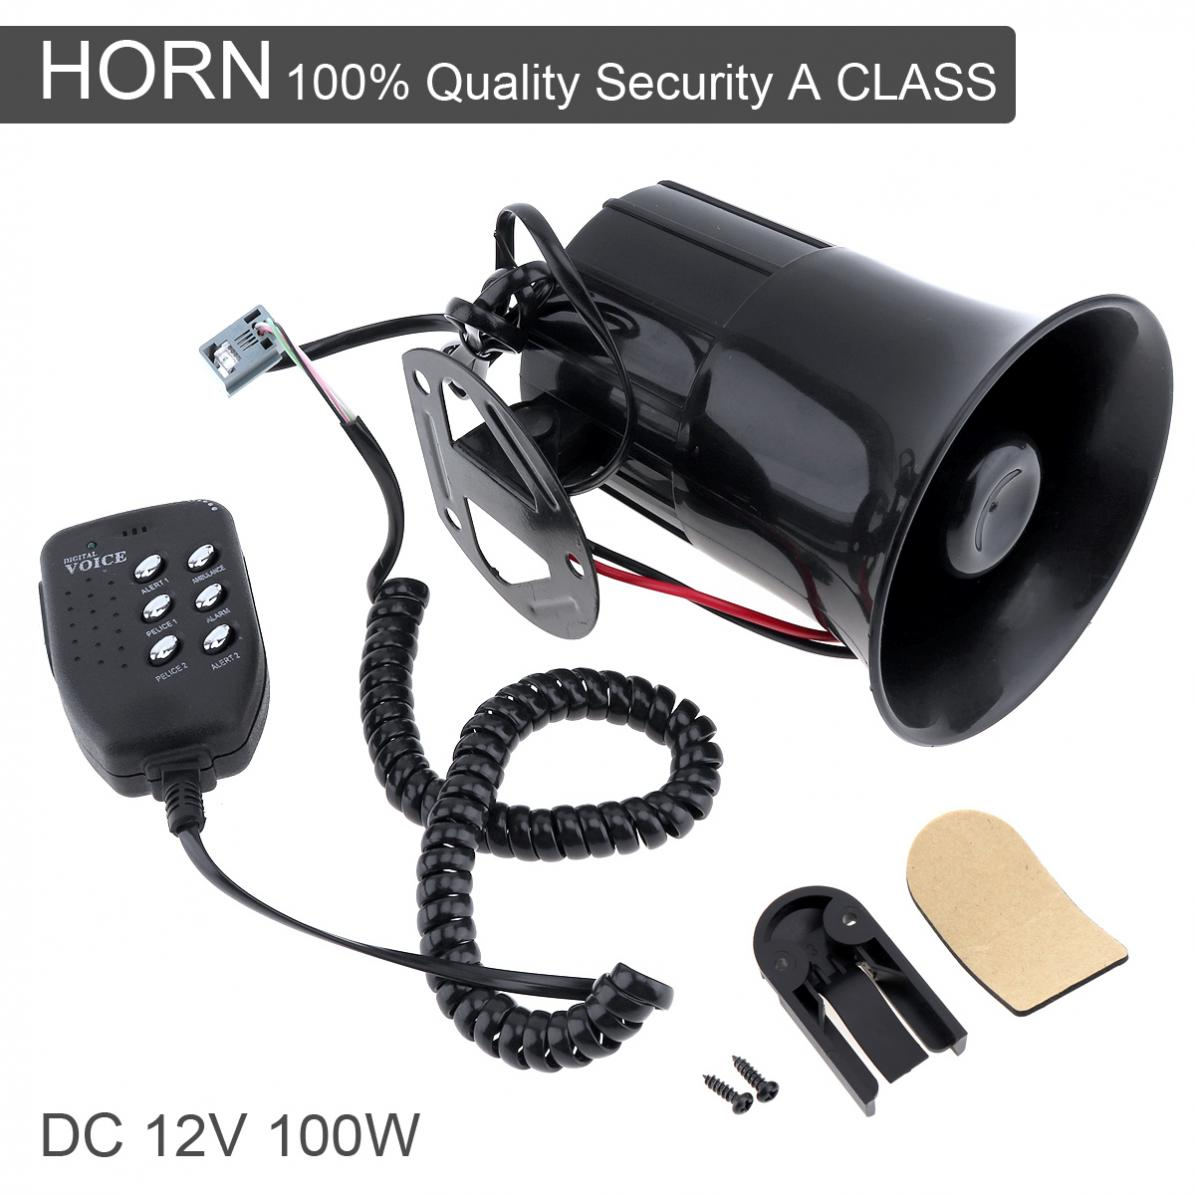 100W 6 Sound Tone Loud Horn Motorcycle Auto Car Vehicle Truck Speaker Warning Alarm Siren Police Fire Ambulance Horn Loudspeaker